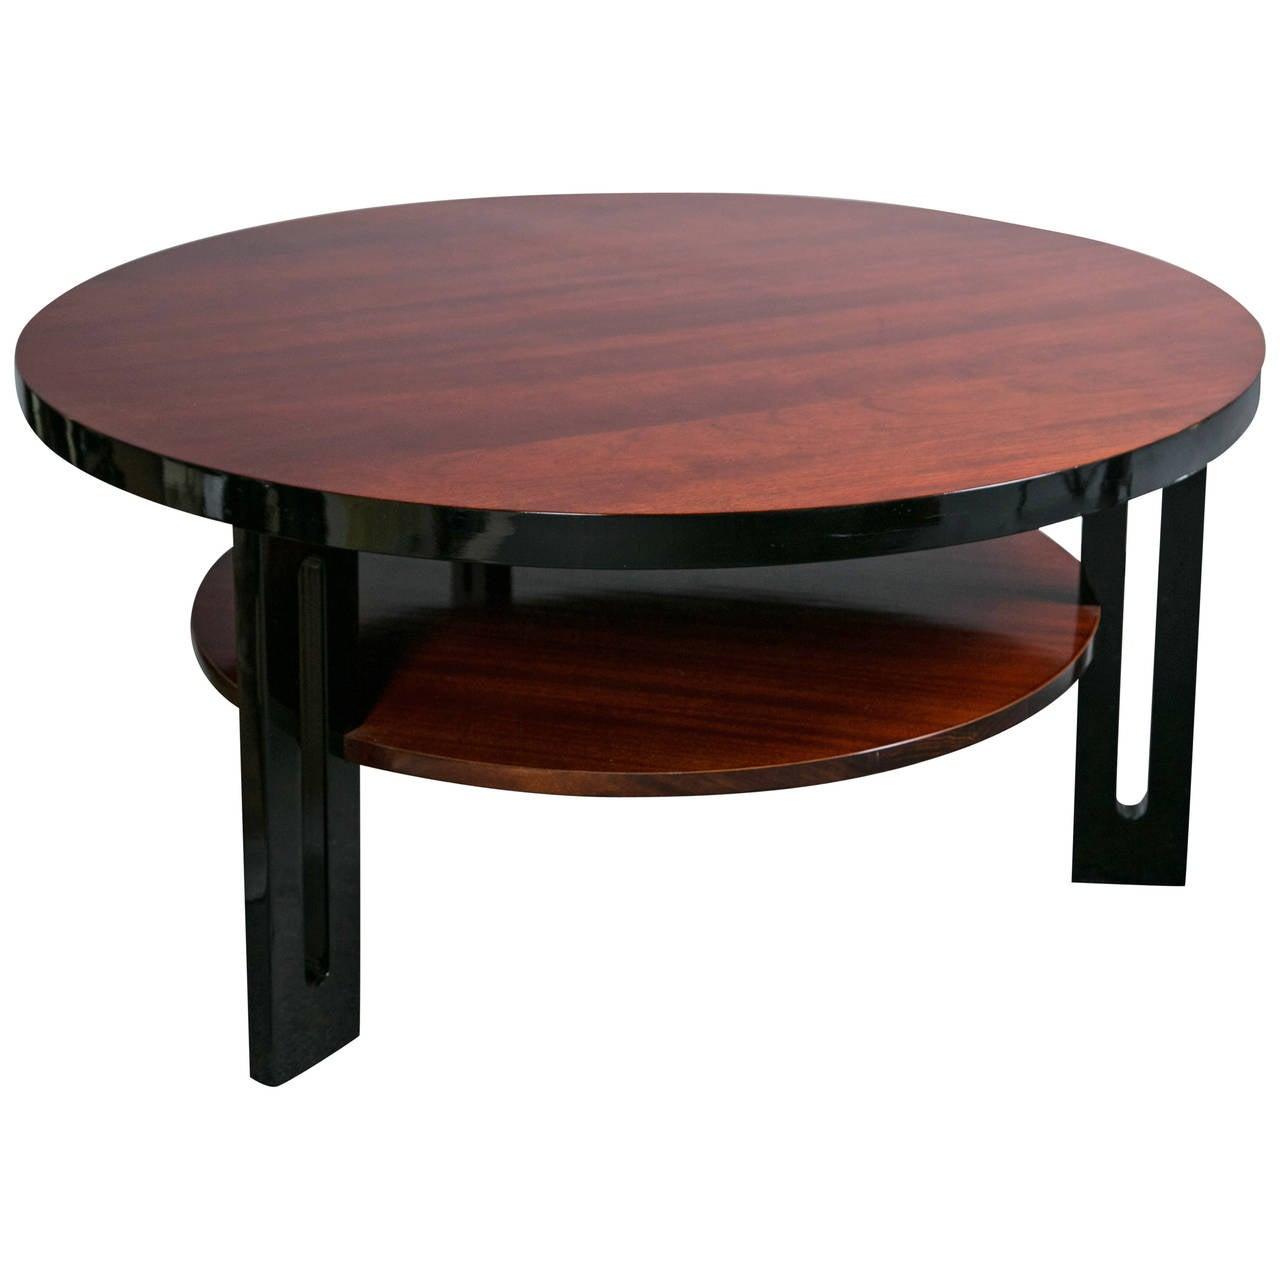 Mahogany And Ebony Art Deco Two Tier Round Coffee Table At 1stdibs